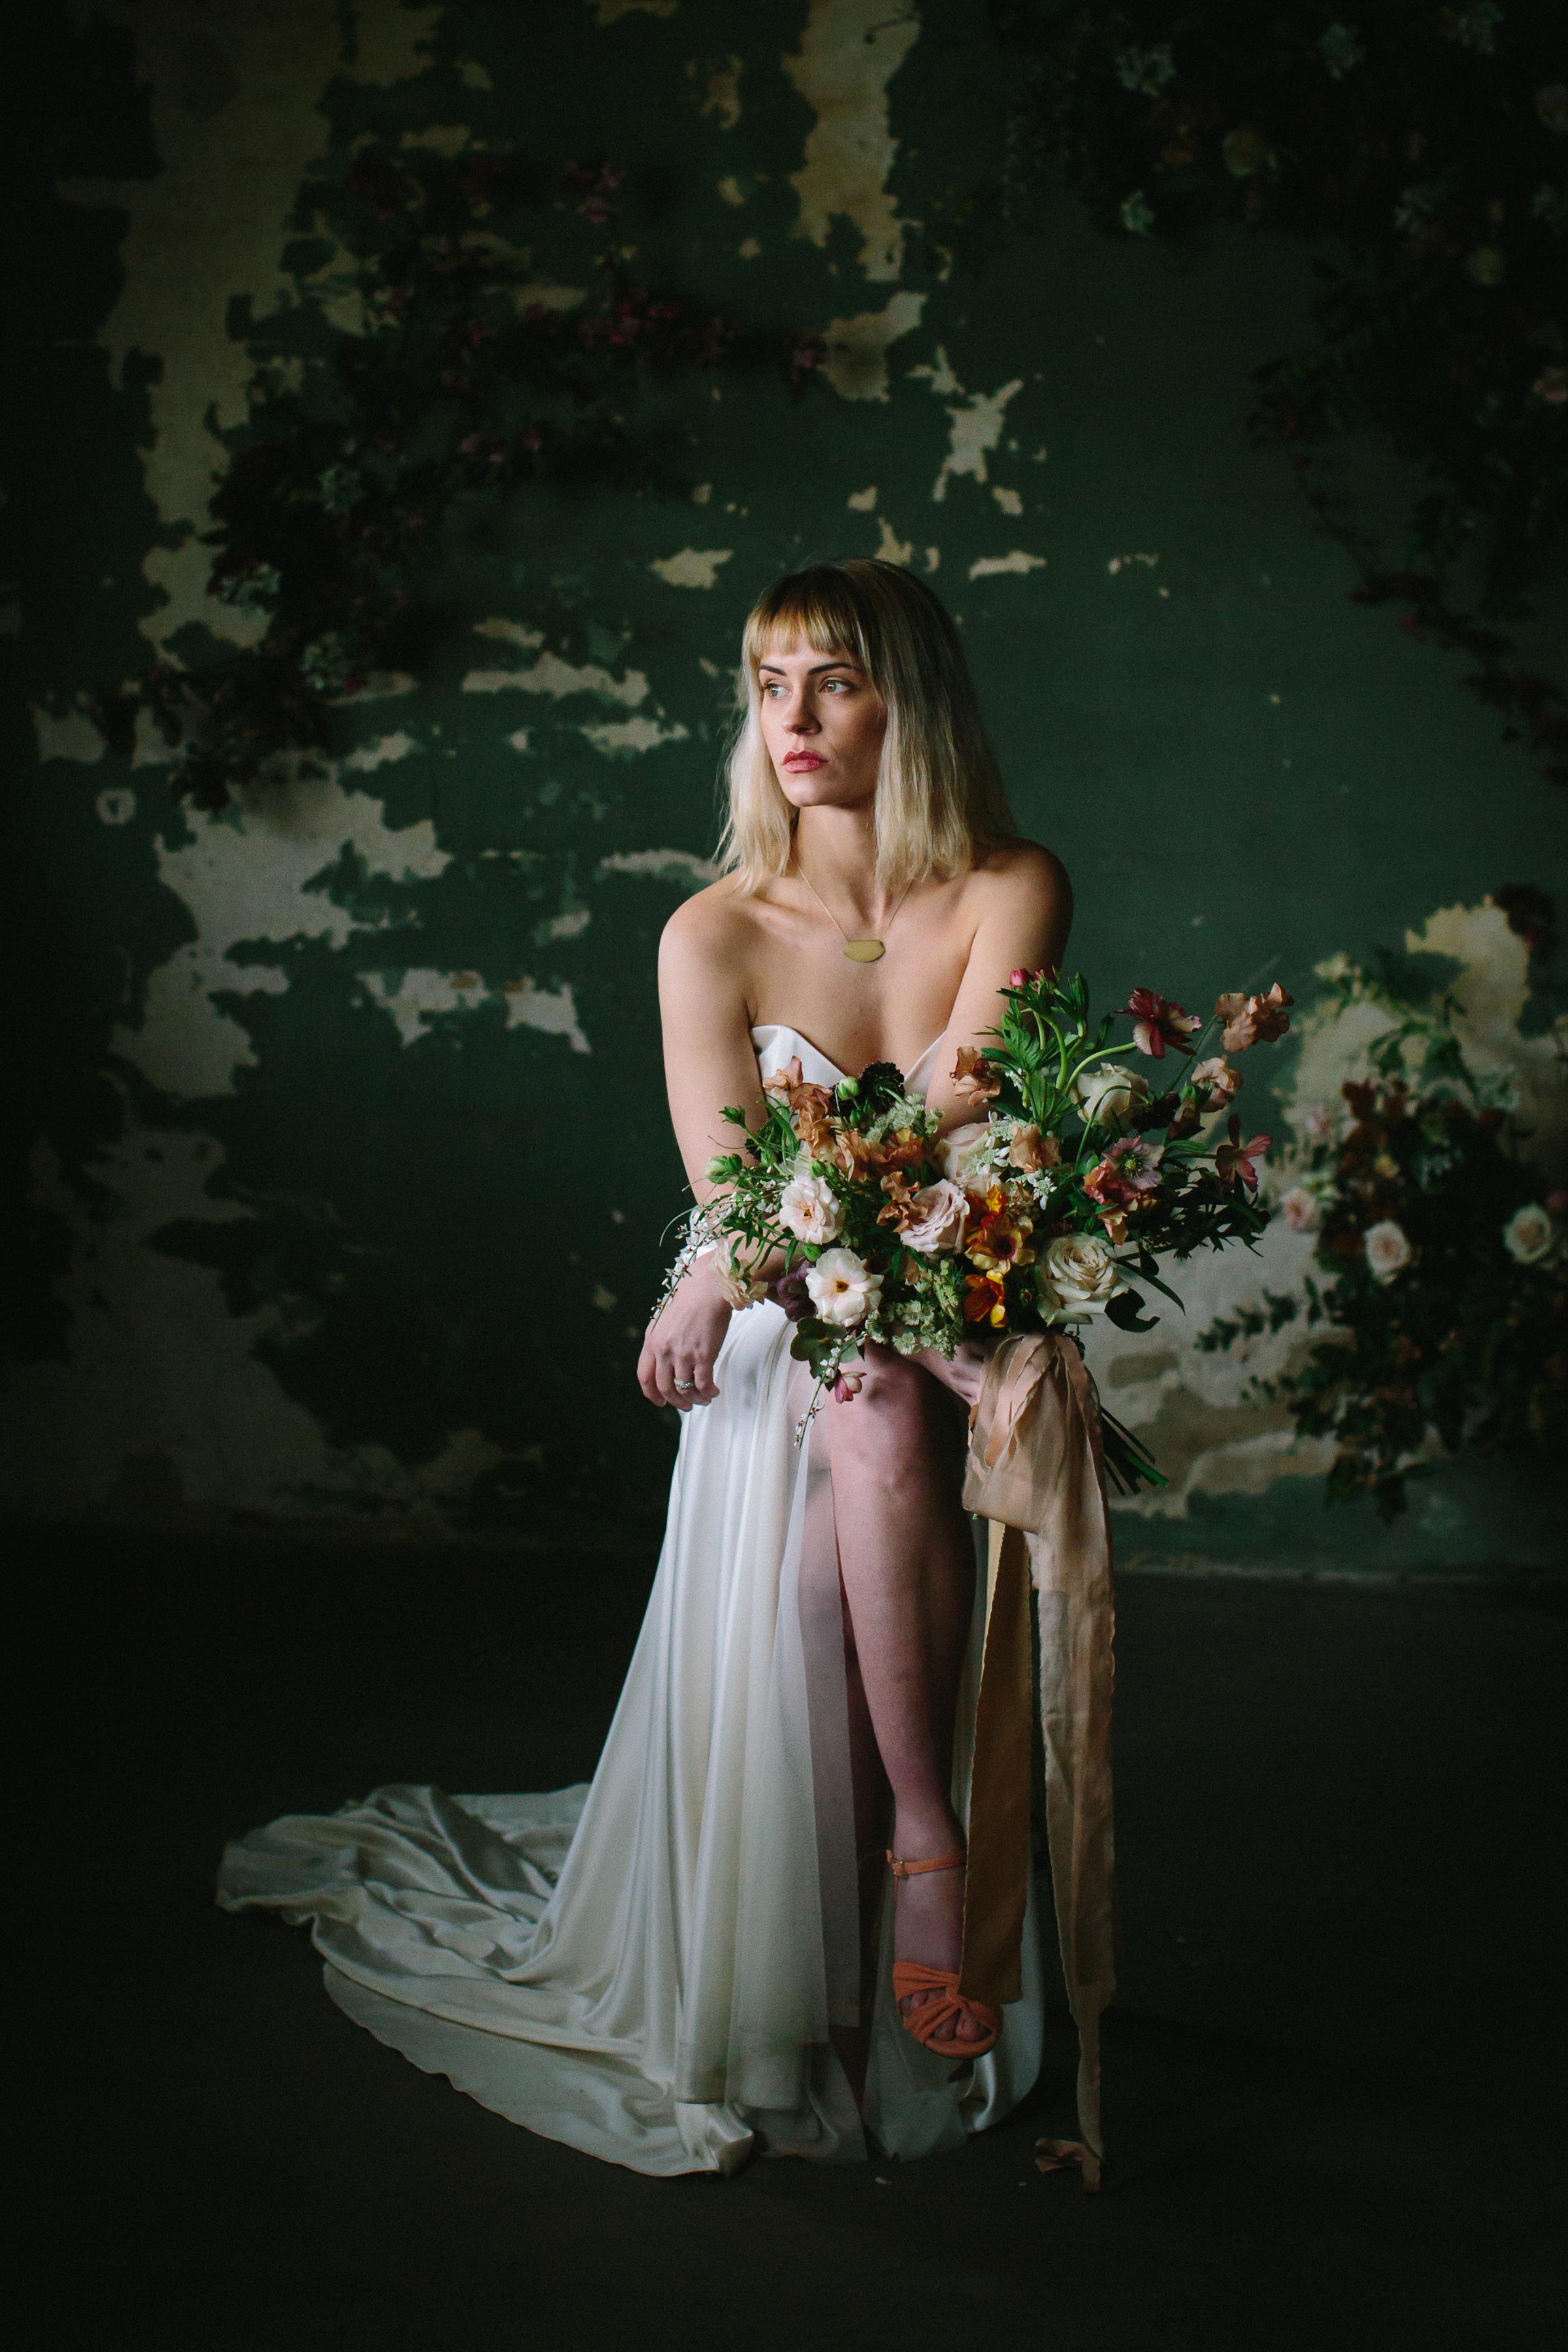 spring_flowers_bouquet_bridal_floridesigns (10 of 25).jpg